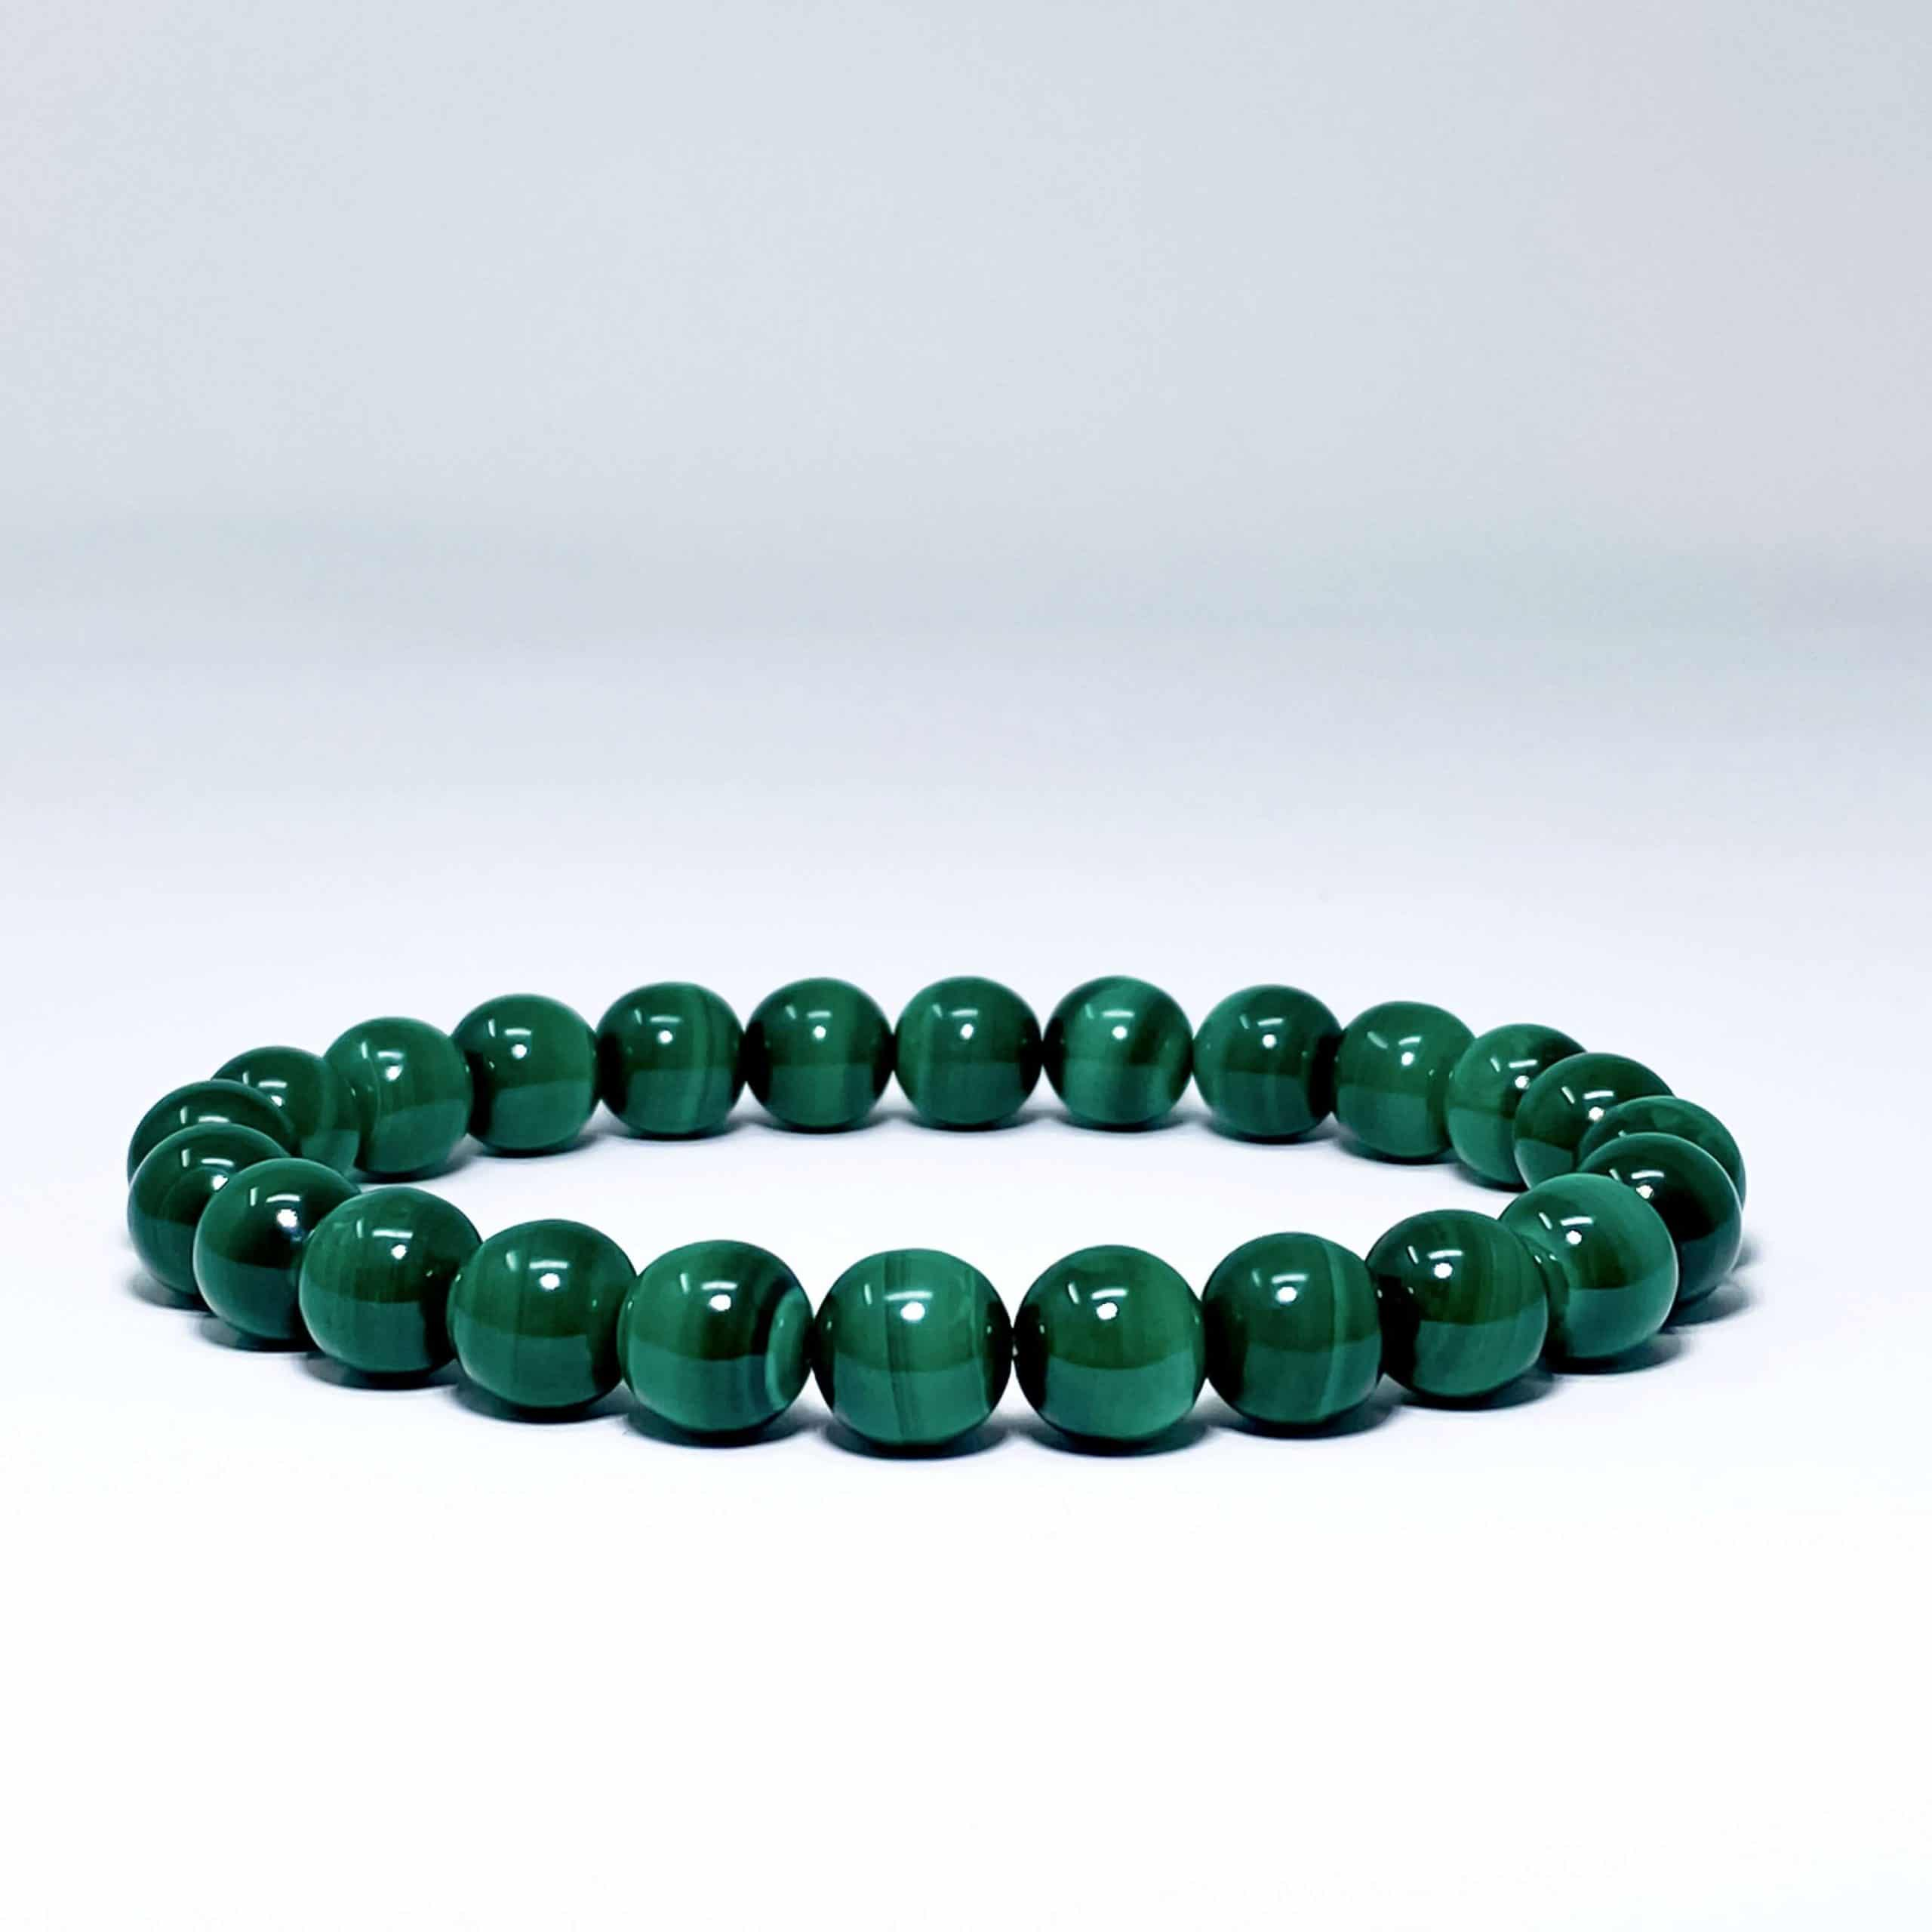 malchite beaded bracelet stone1 scaled